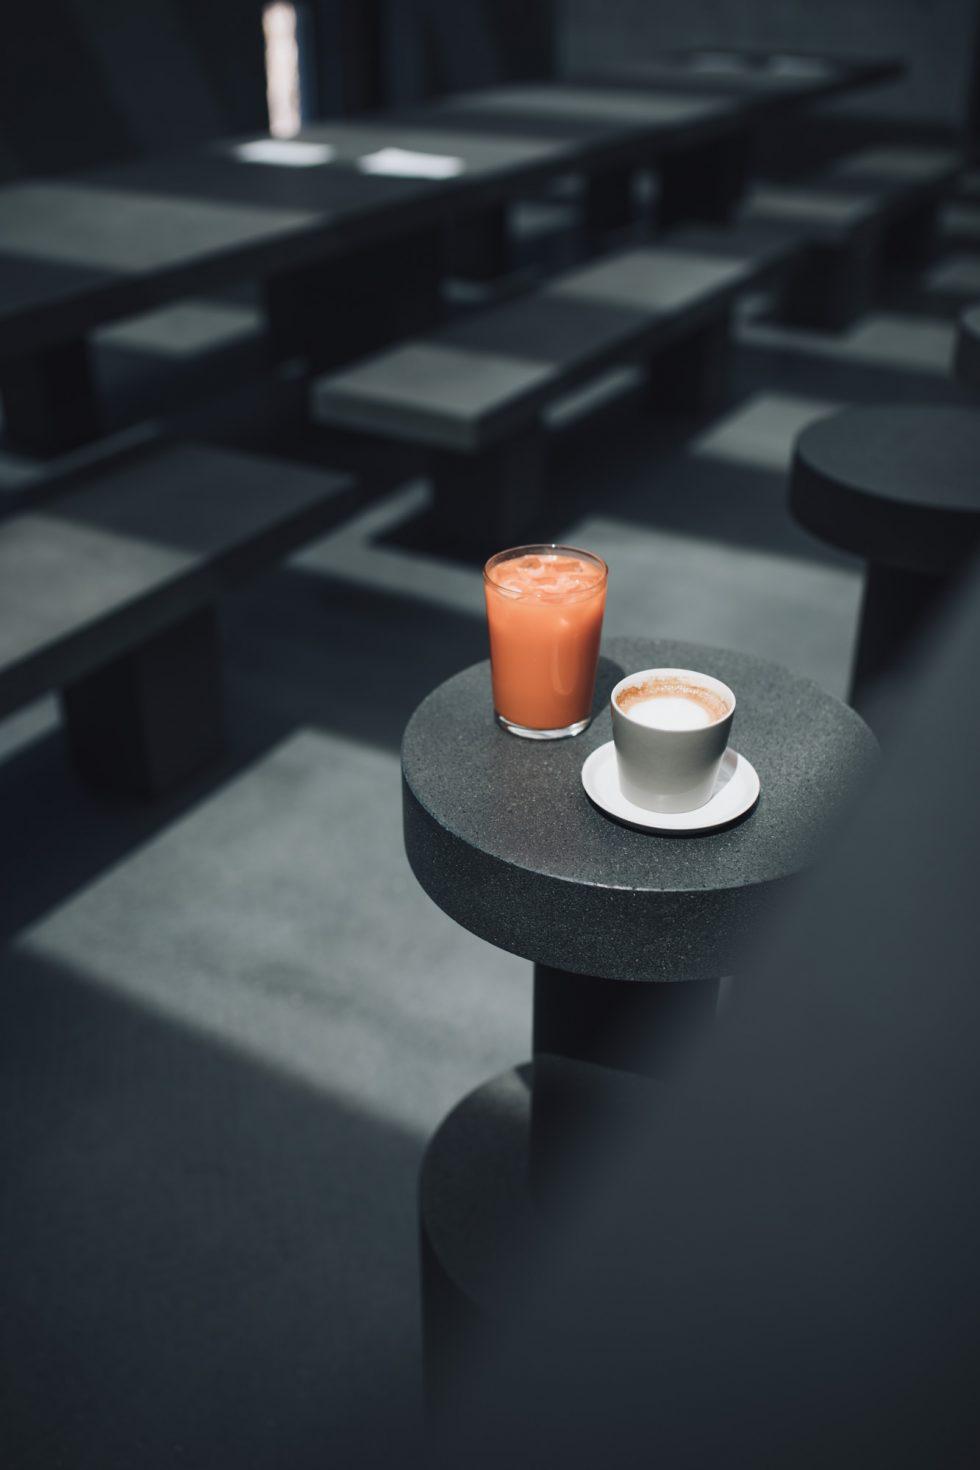 ssense-fashion-coffee-shop-montreal-lifestyle-photographer-laura-g-diaz-2